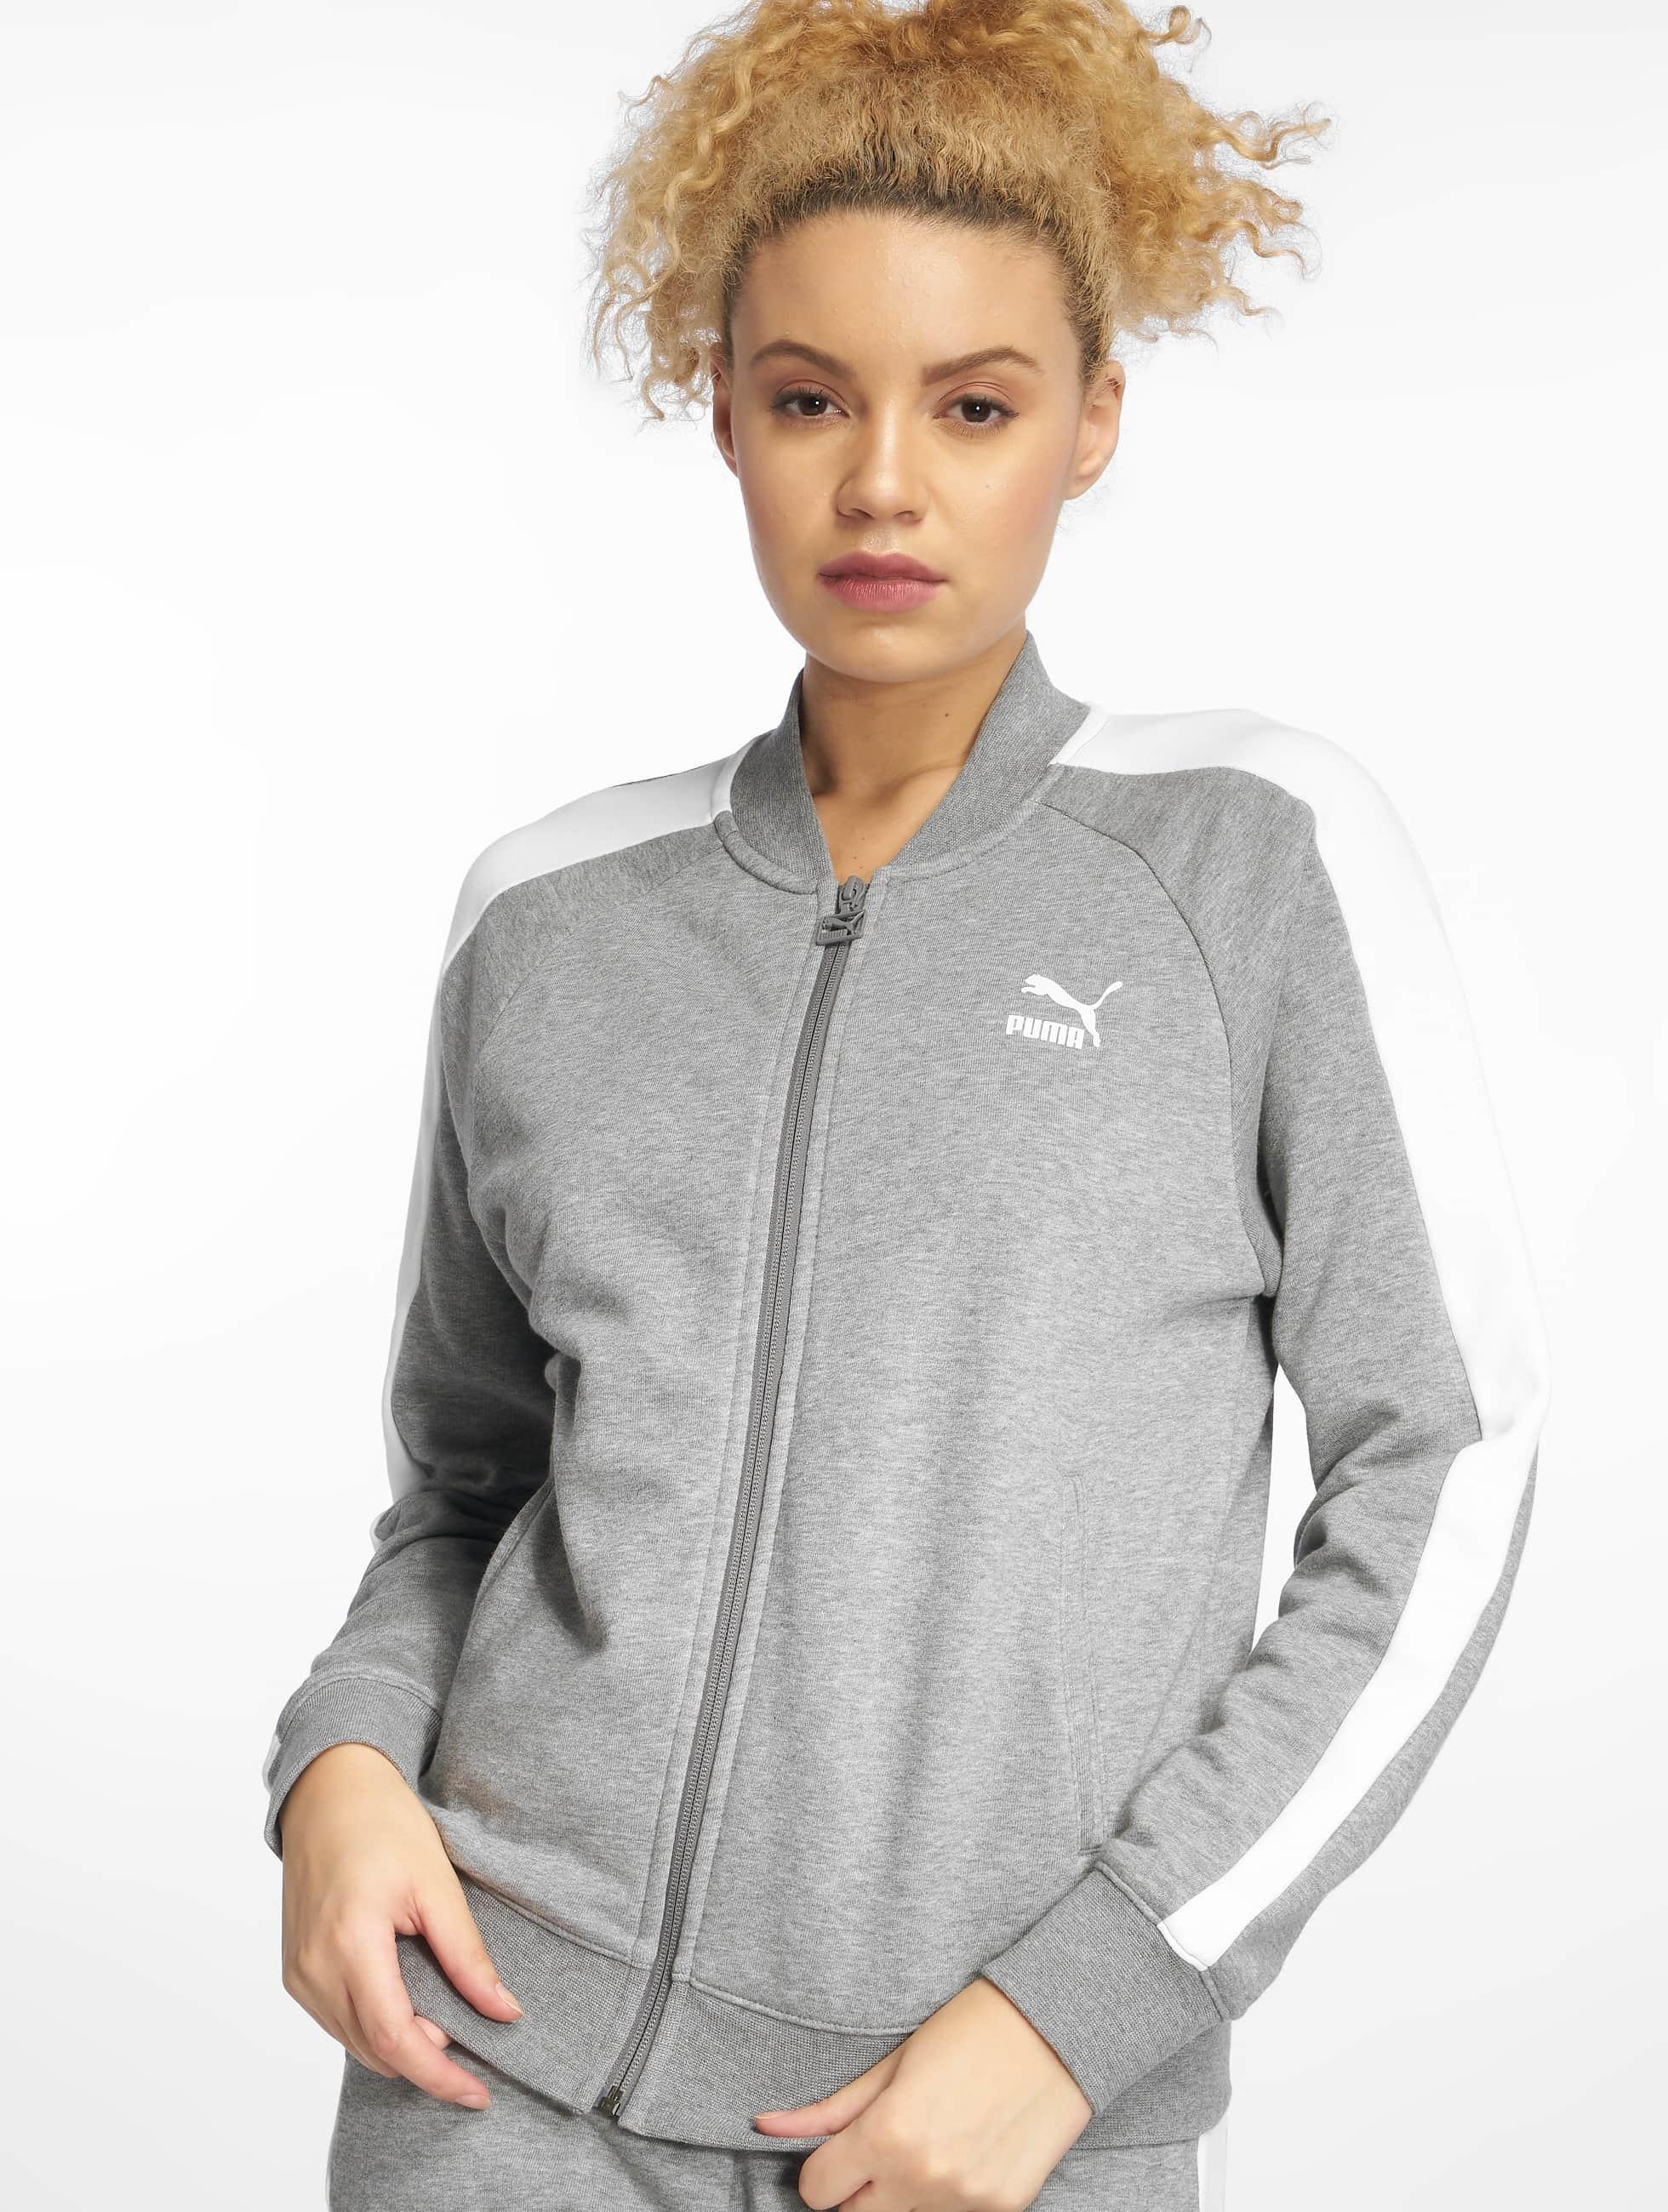 Puma Classics T7 Track Jacket Medium Gray Heather